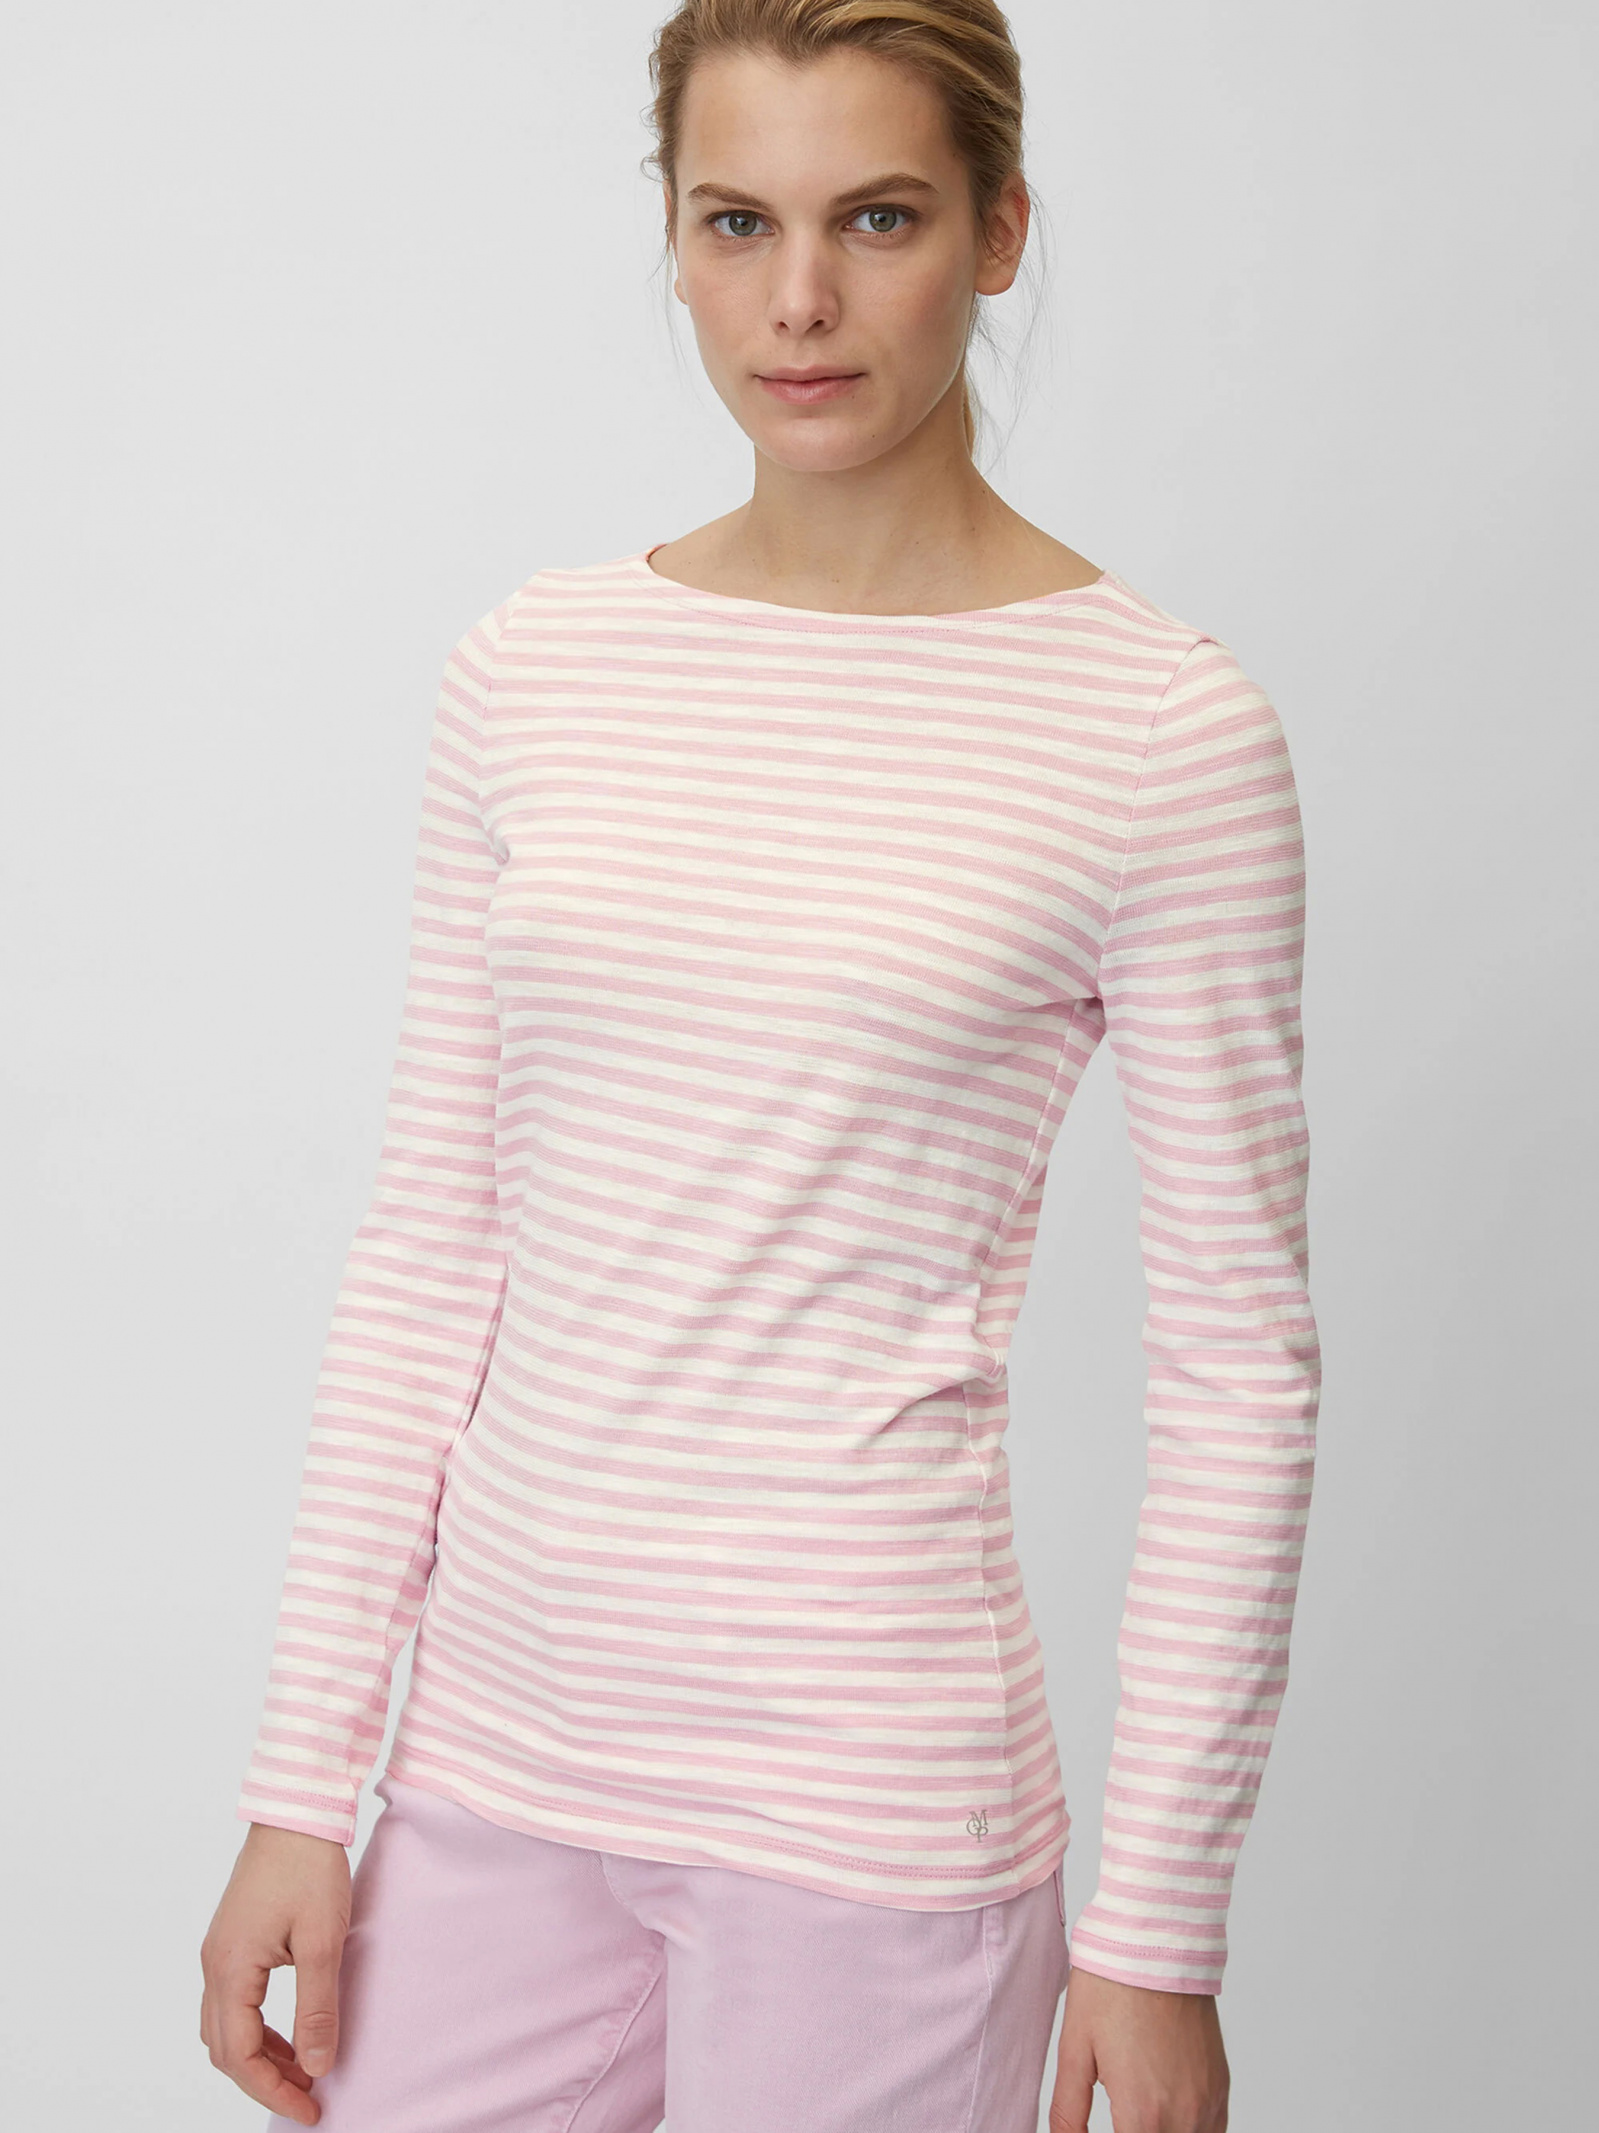 Кофты и свитера женские MARC O'POLO модель PF4010 характеристики, 2017